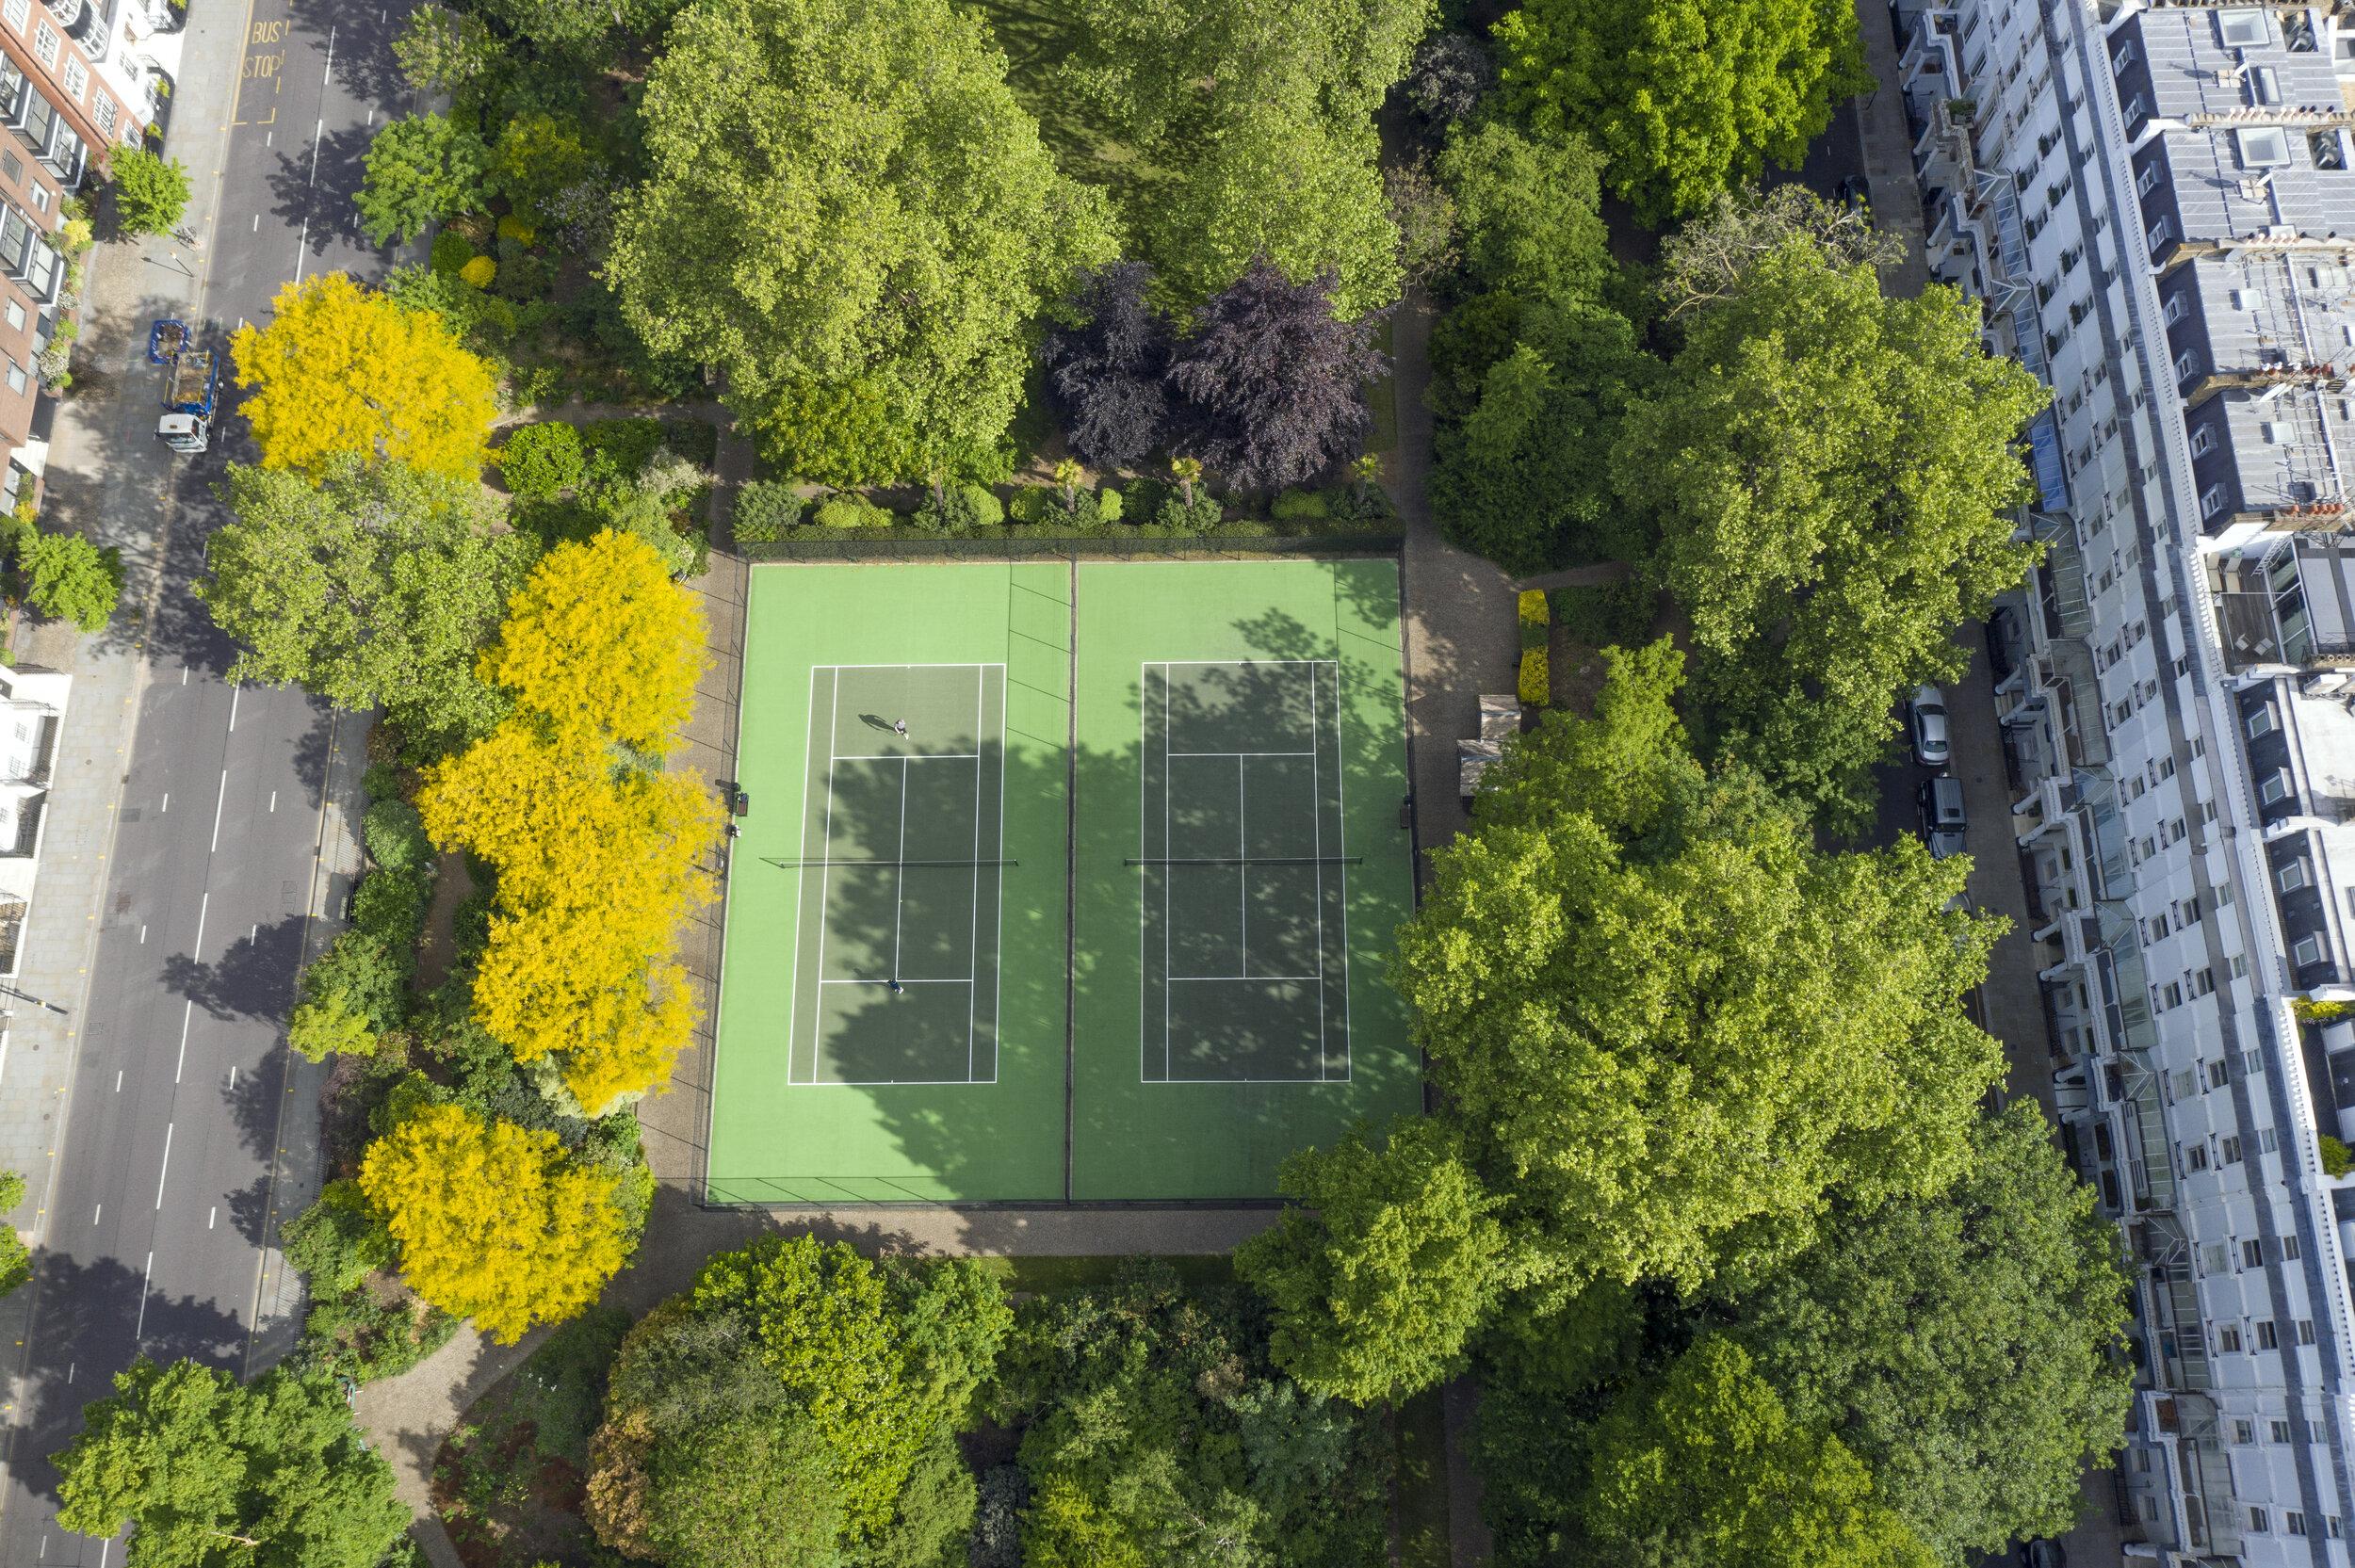 FrancisHolland-DronePrep-London.jpg